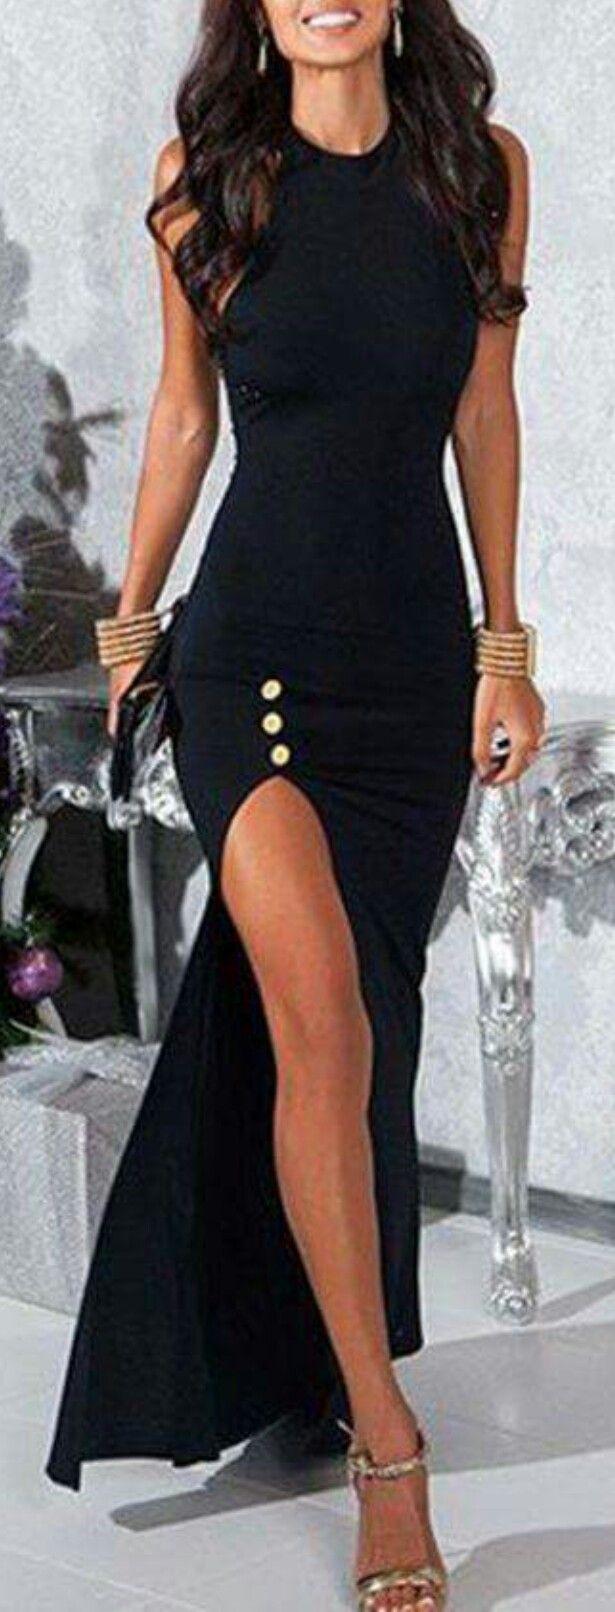 Pin by cris jiher on vestidos largos long dresses pinterest